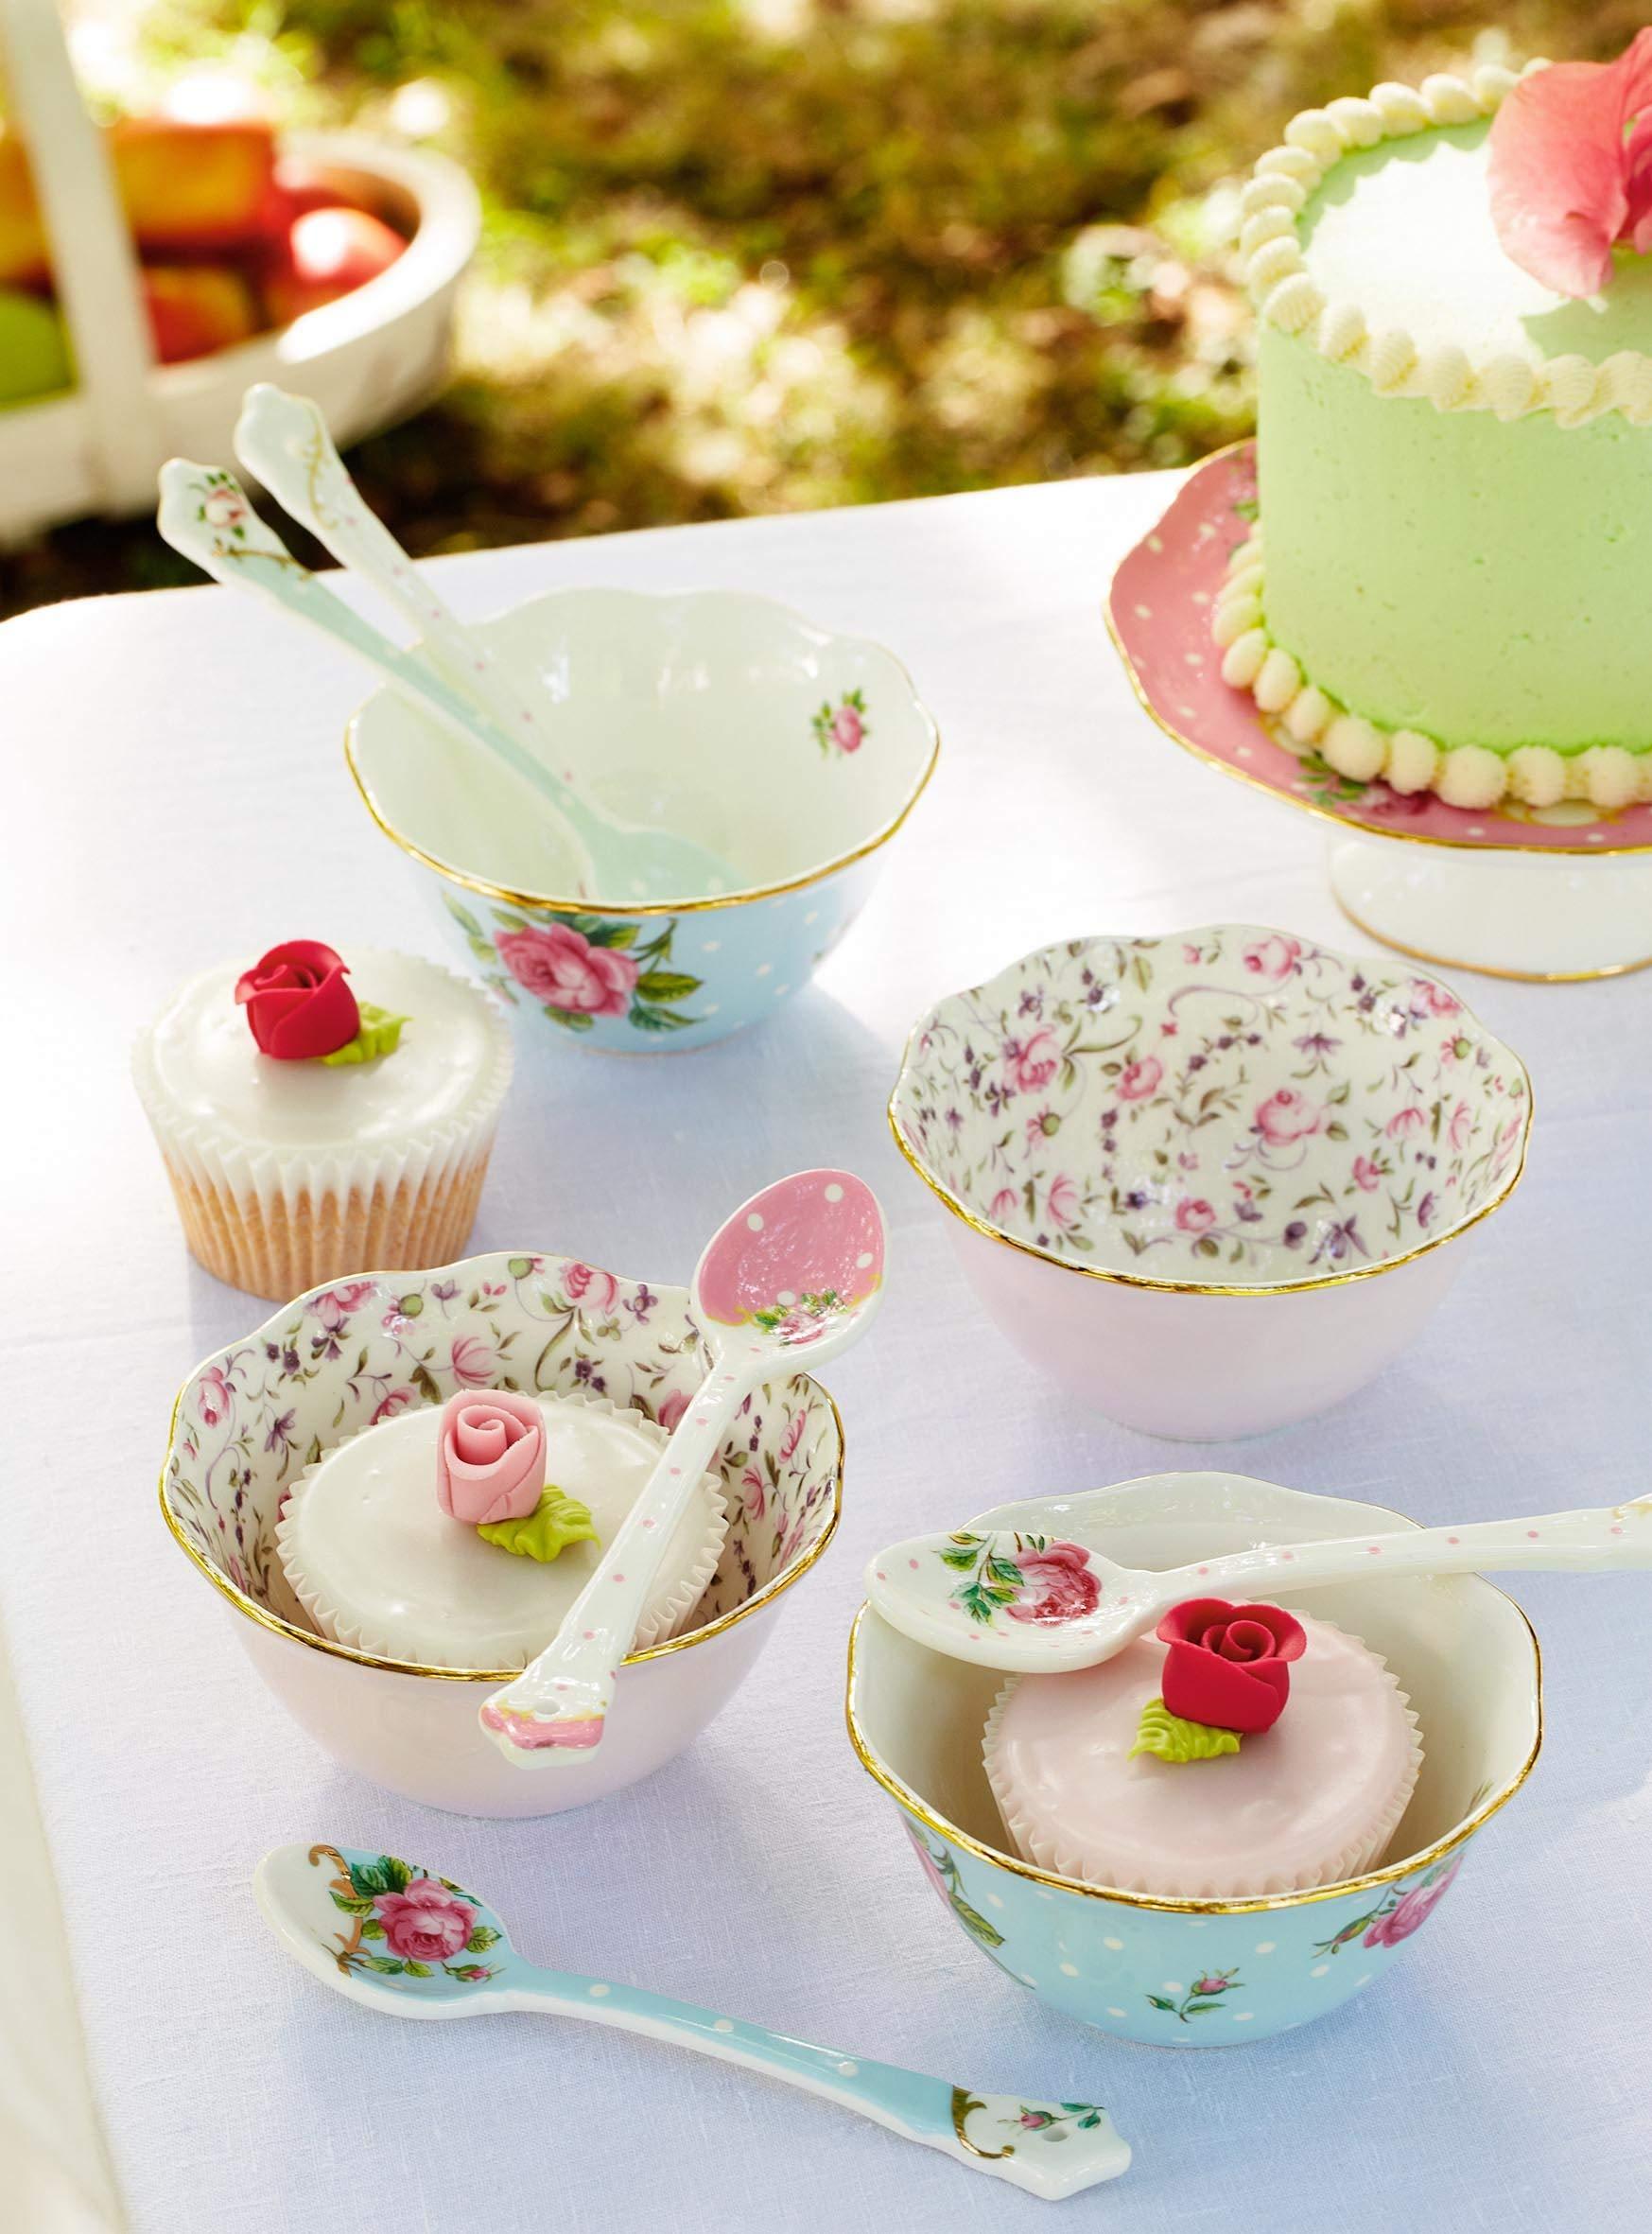 Royal Albert Set of 4 Mixed Ceramic Spoons by Royal Albert (Image #4)